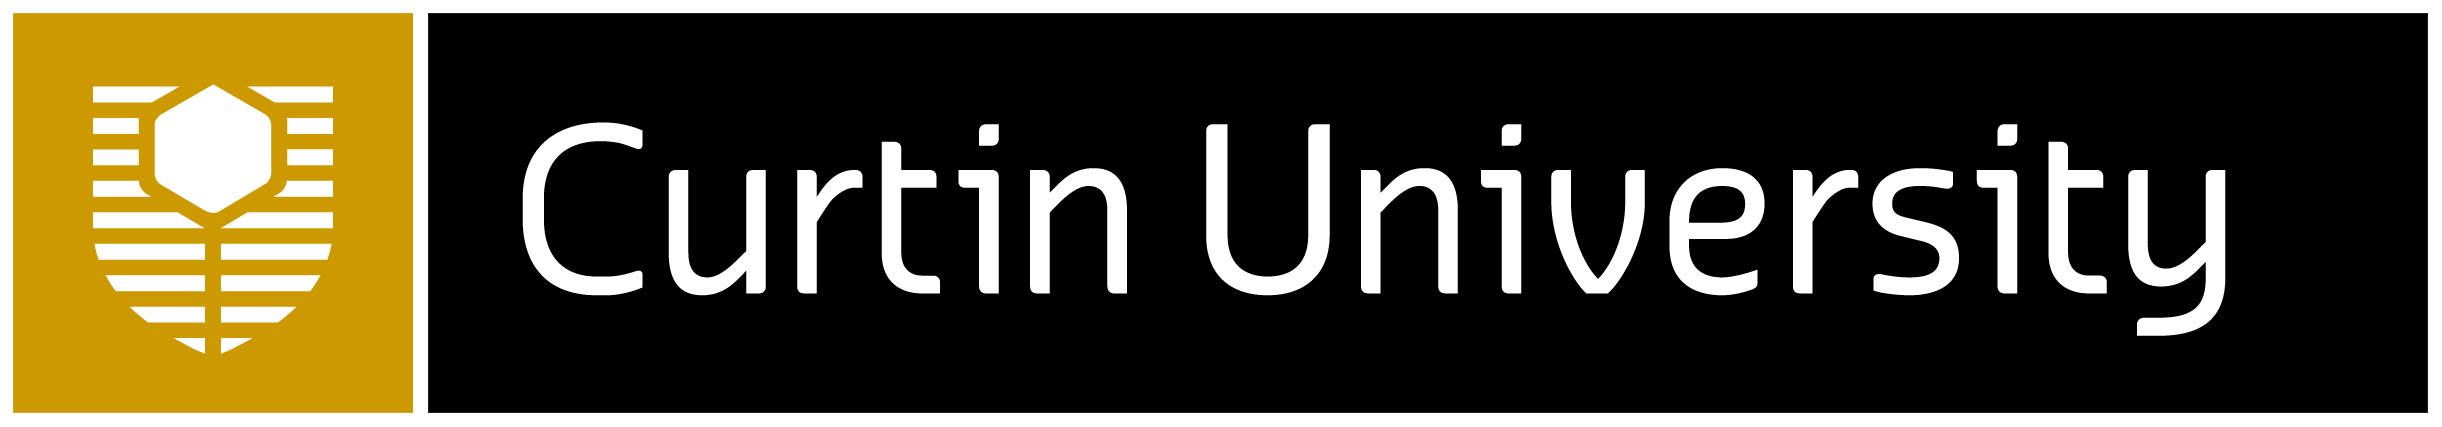 curtin-university-logo.png